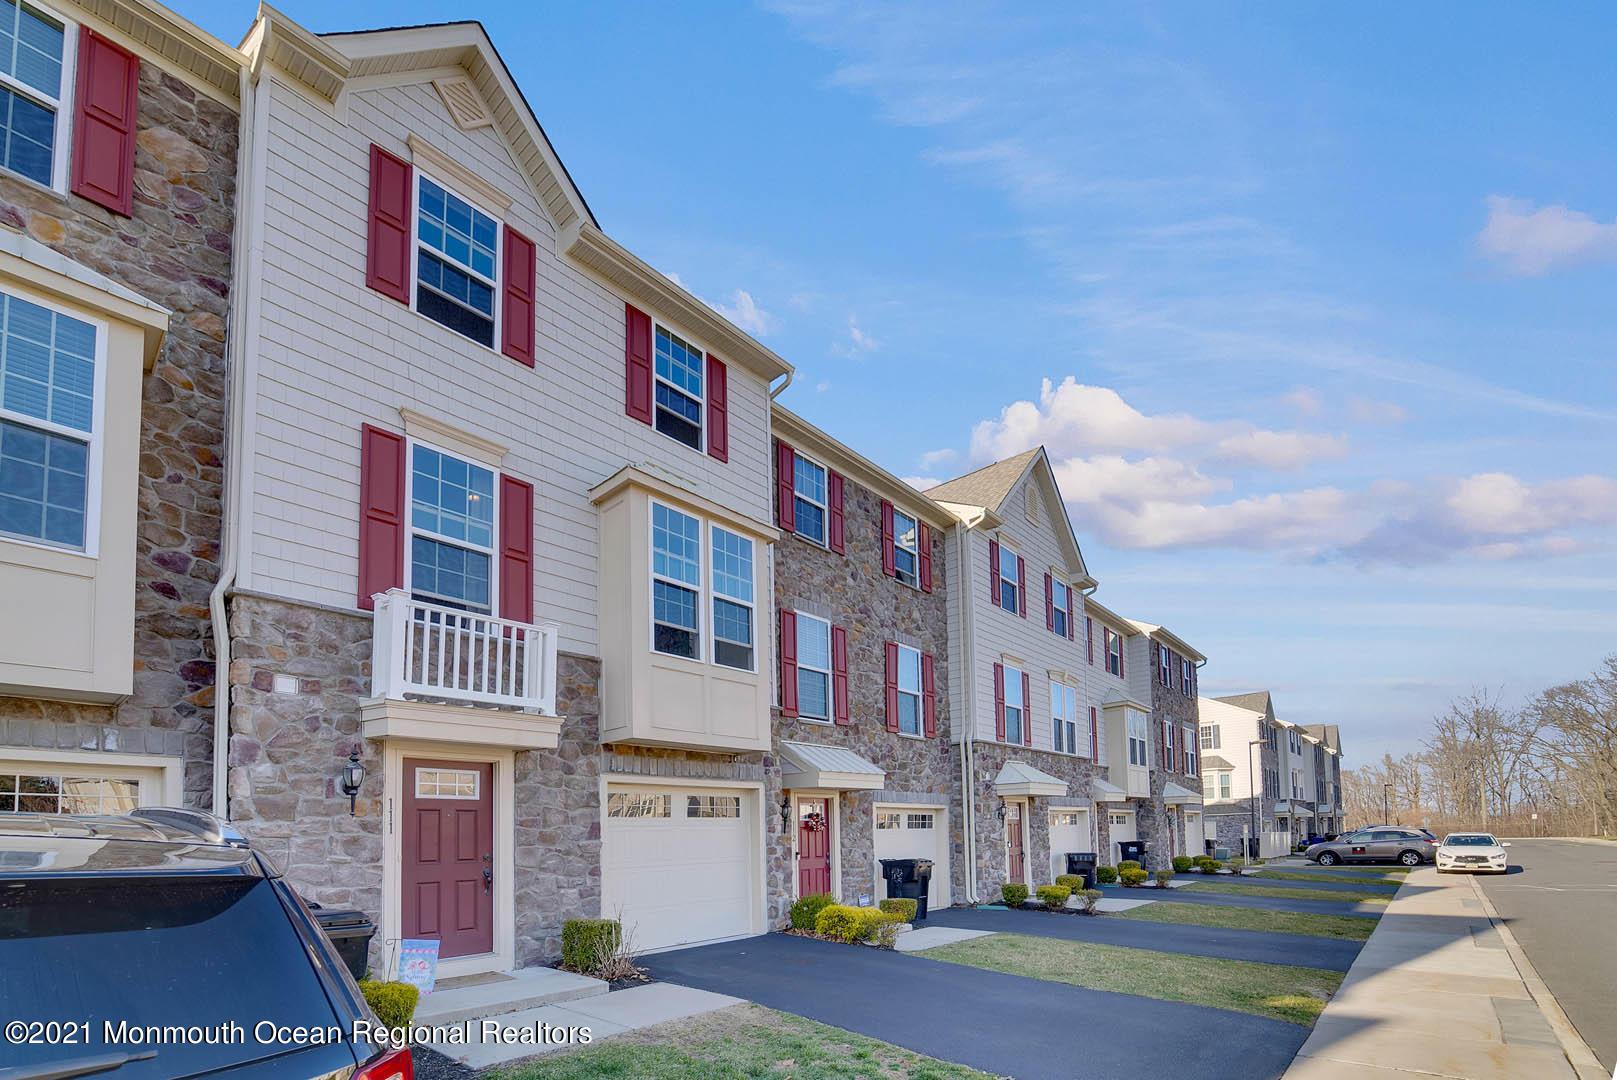 111 Phillip E. Frank Way, Cliffwood, New Jersey 07721, 3 Bedrooms Bedrooms, ,3 BathroomsBathrooms,Townhouse,For Sale,111 Phillip E. Frank Way,3,22108744